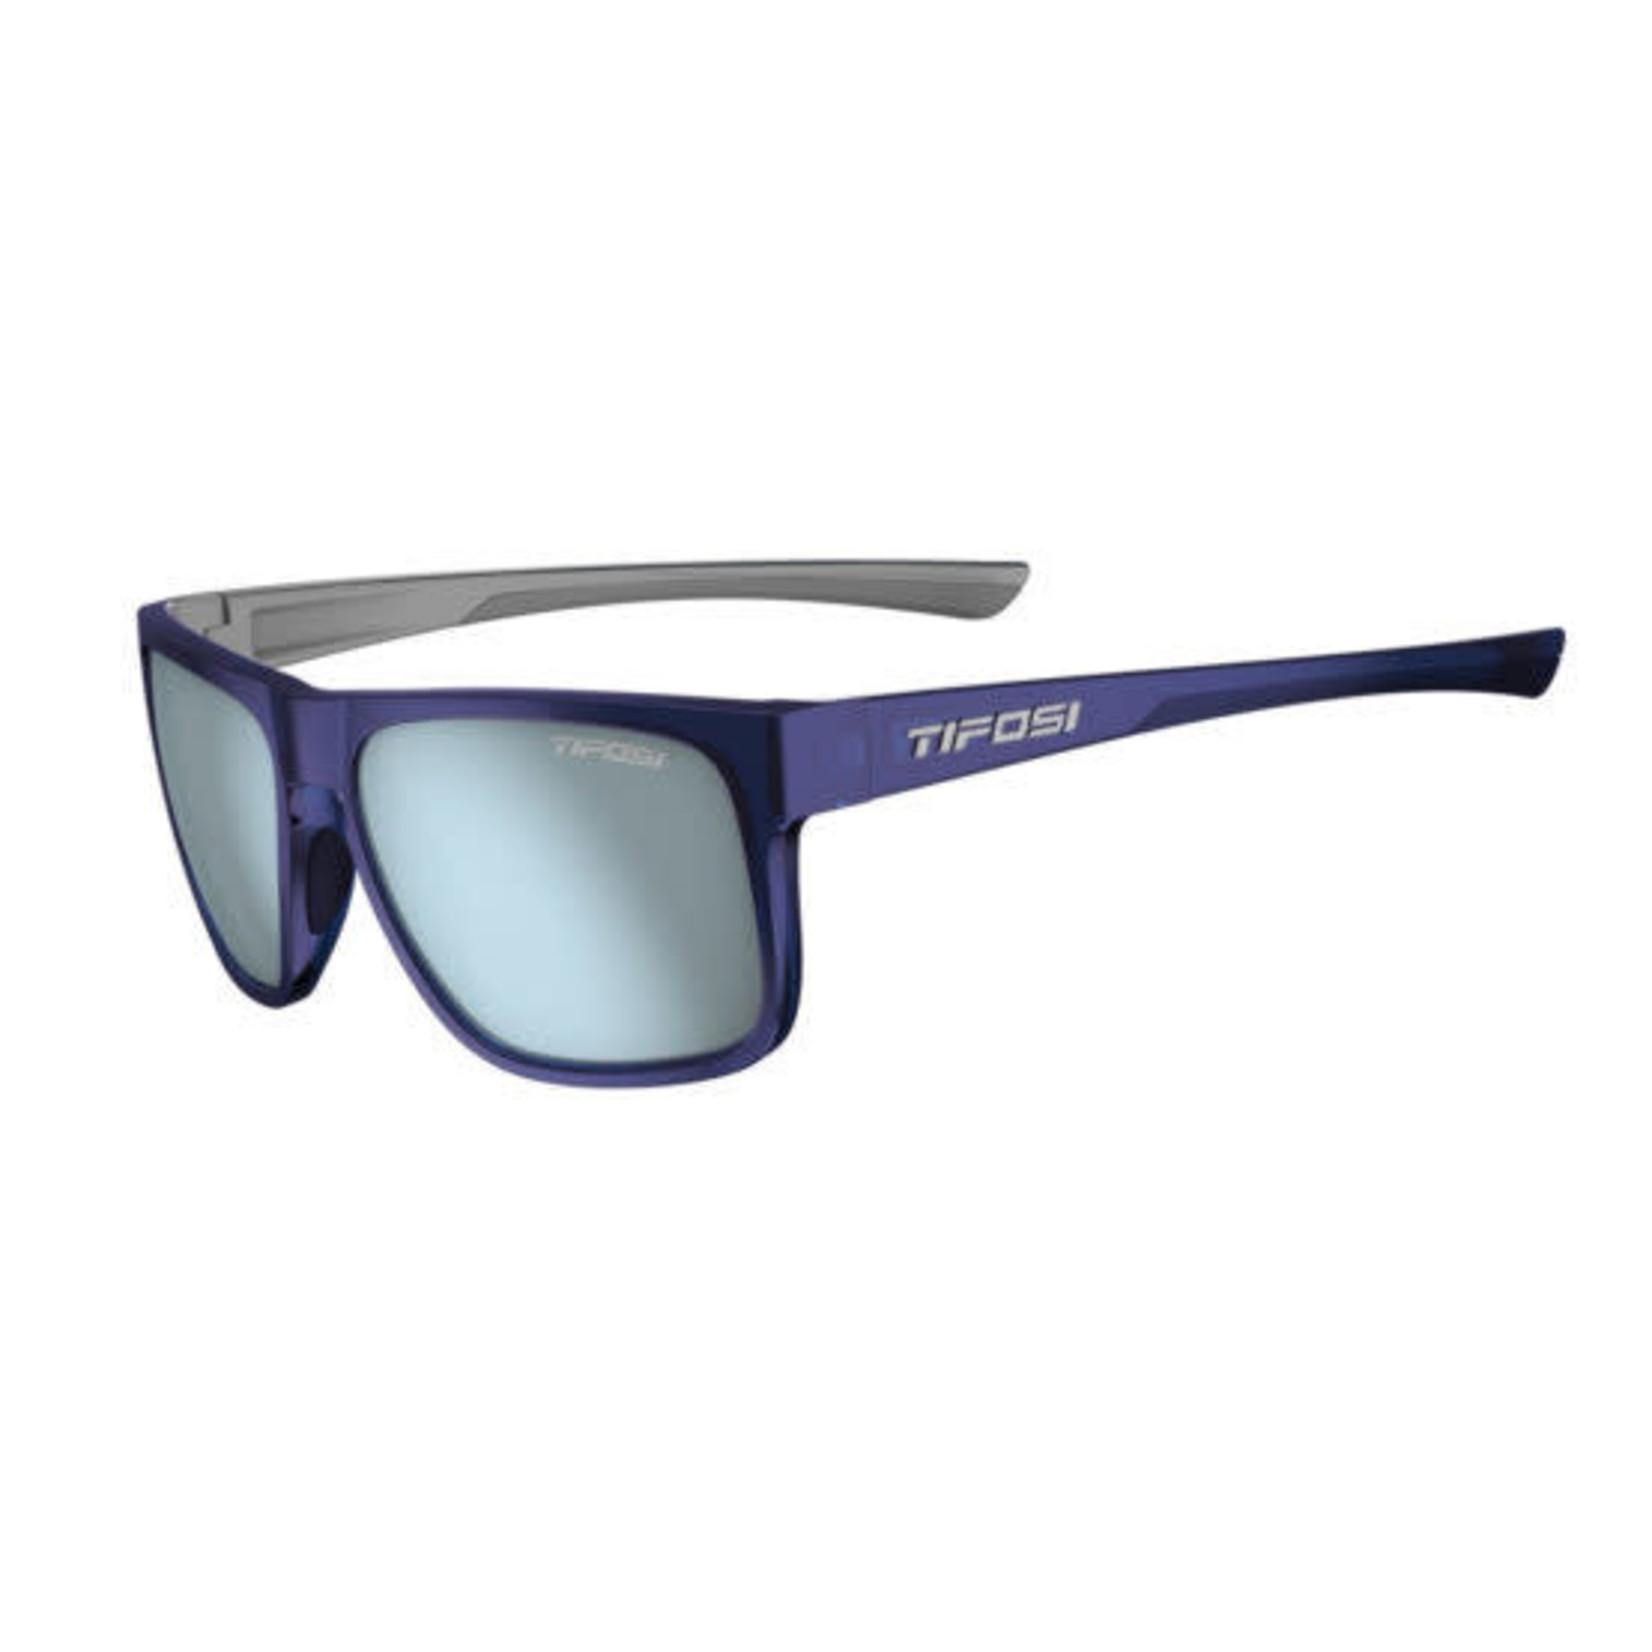 Tifosi Optics Swick, Midnight Navy Single Lens Sunglasses